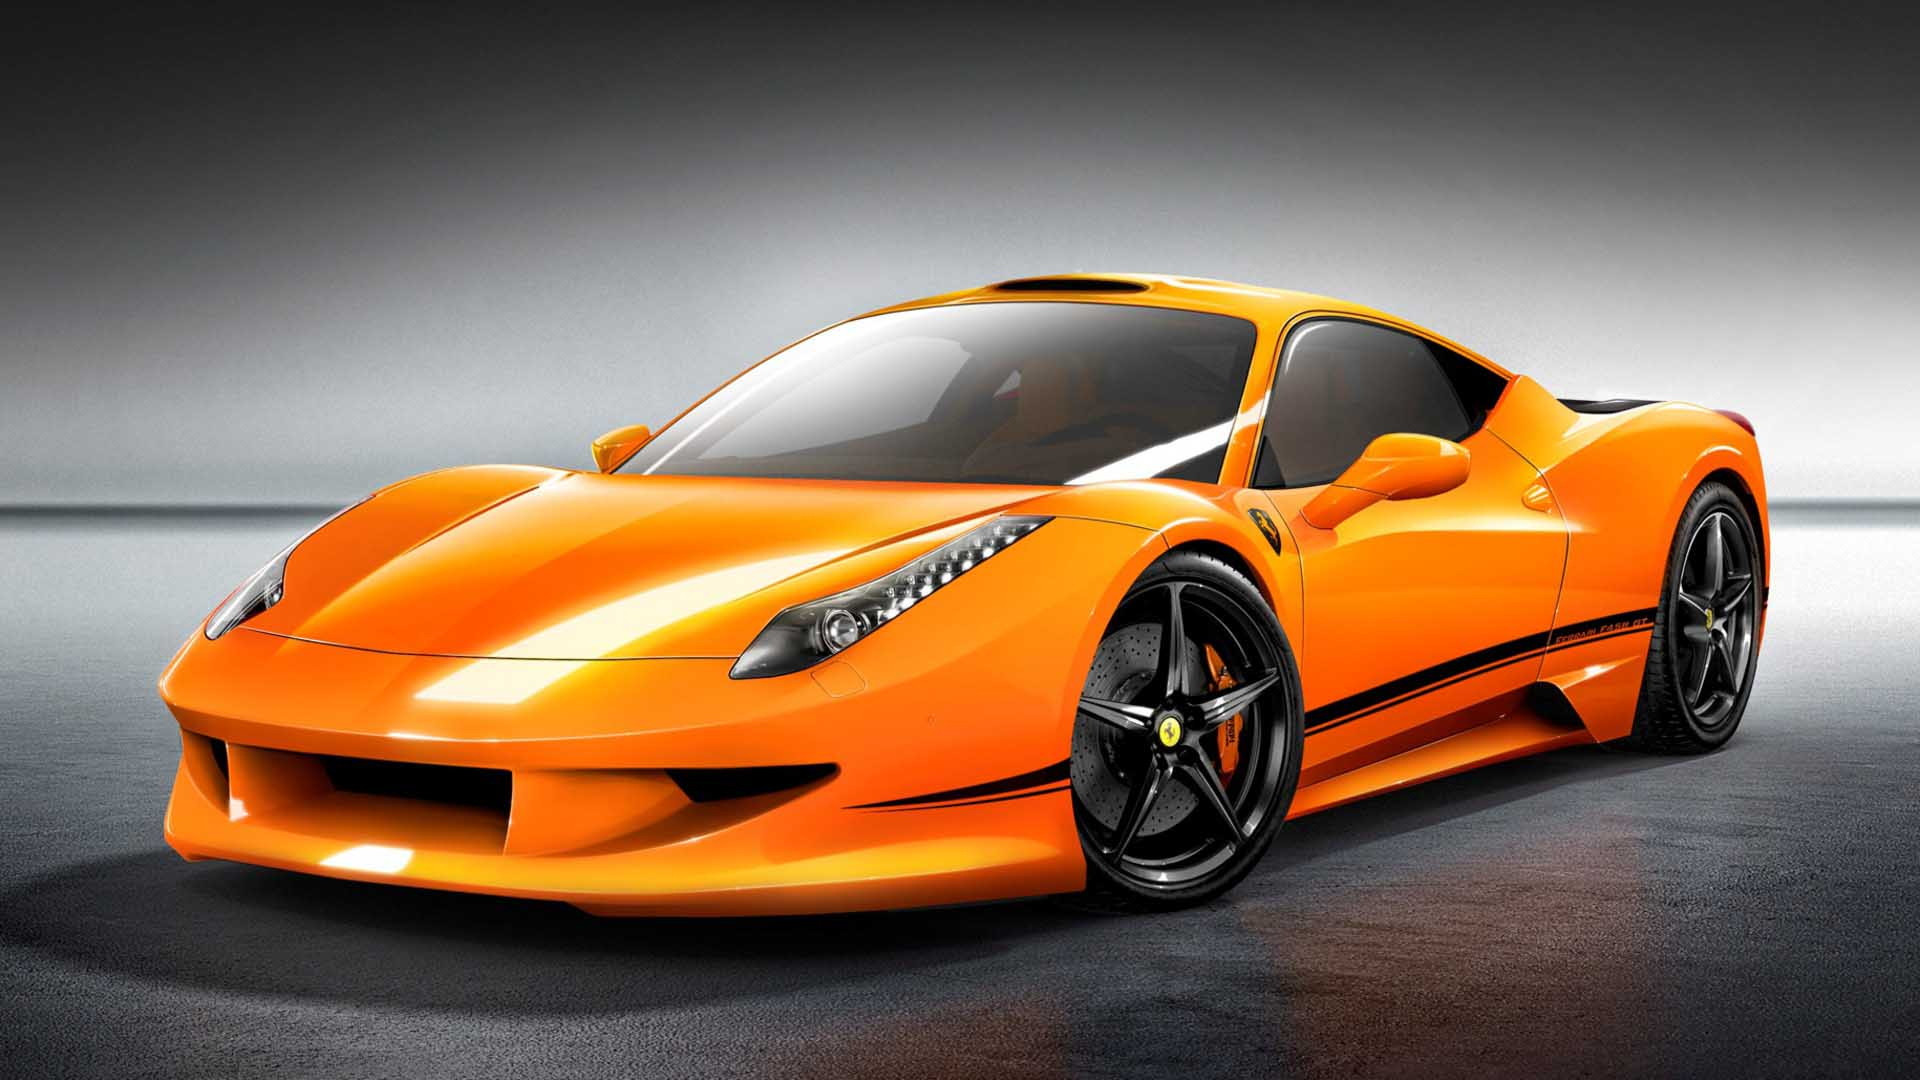 Orange Car Wallpapers Top Free Orange Car Backgrounds Wallpaperaccess